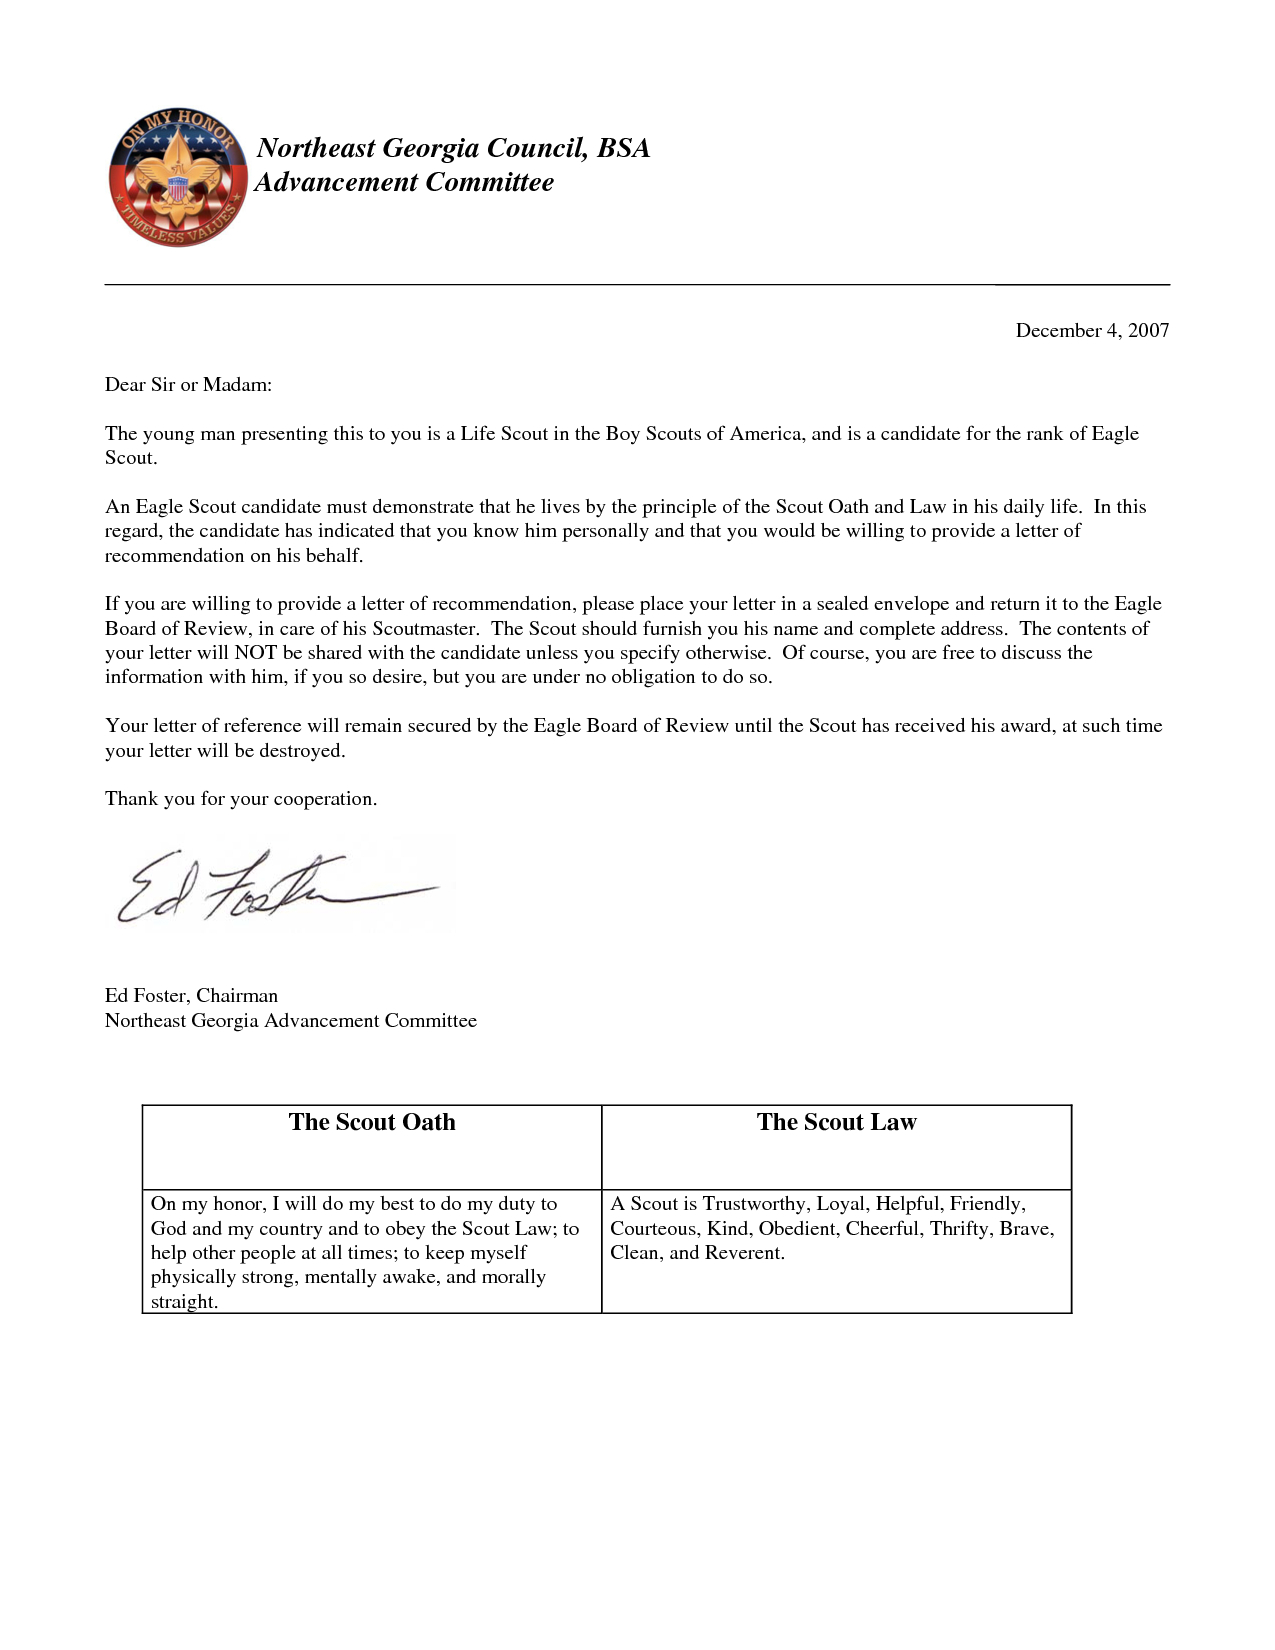 Eagle Recommendation Letter Template - Sample Eagle Re Mendation Letter Acurnamedia